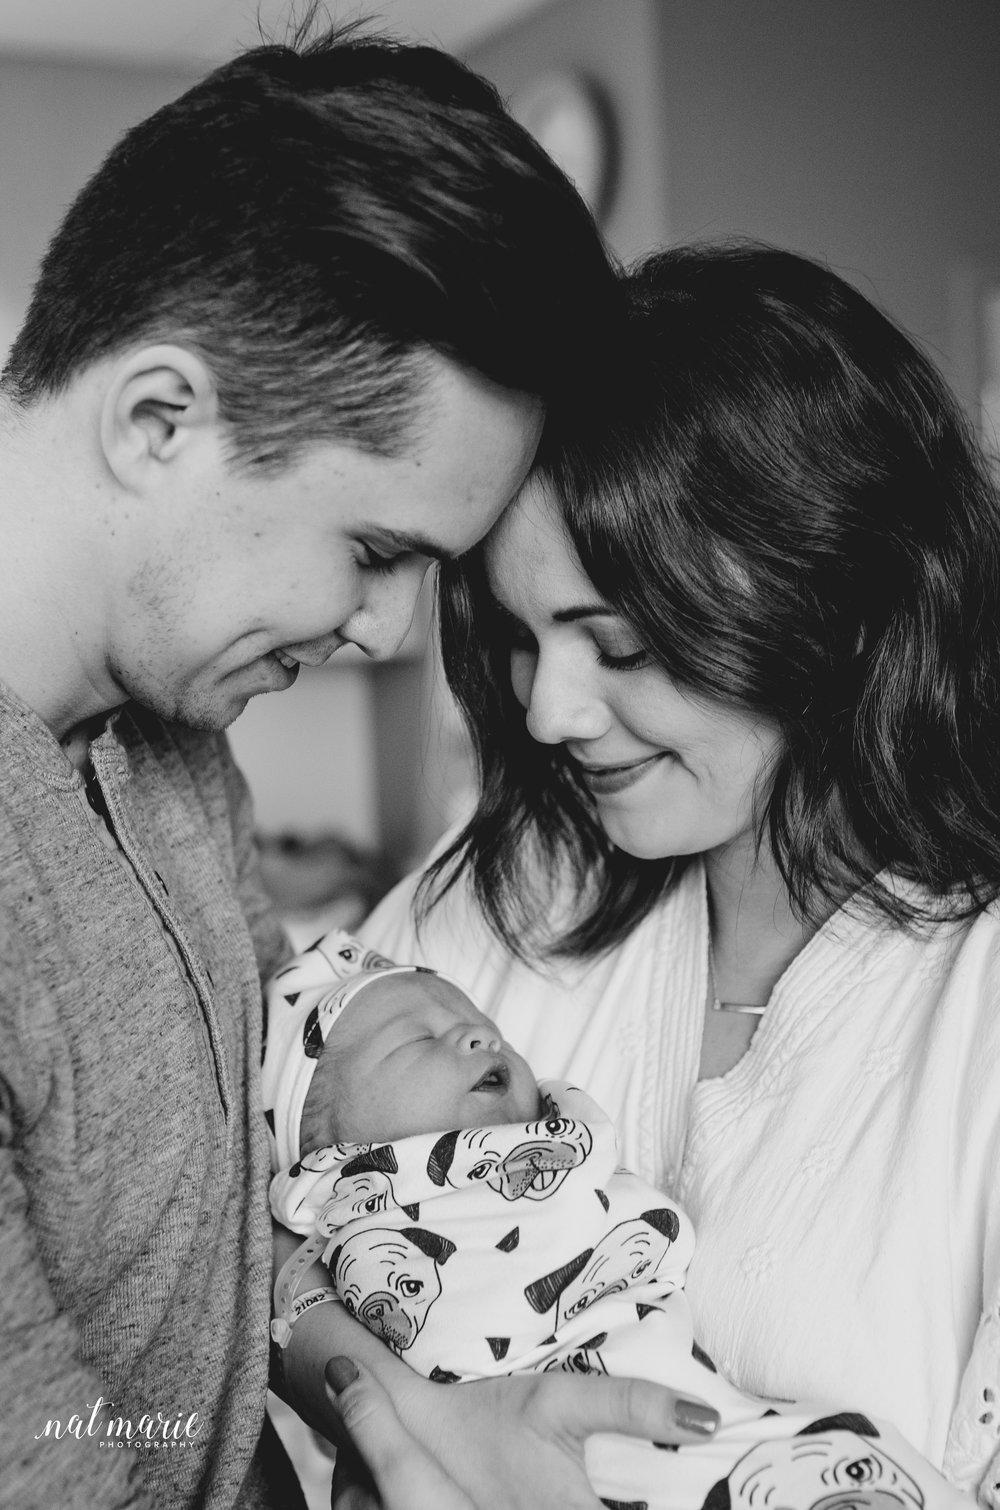 Gilbert, AZ Hospital Fresh 48 Newborn Photographer - Elegant Photos